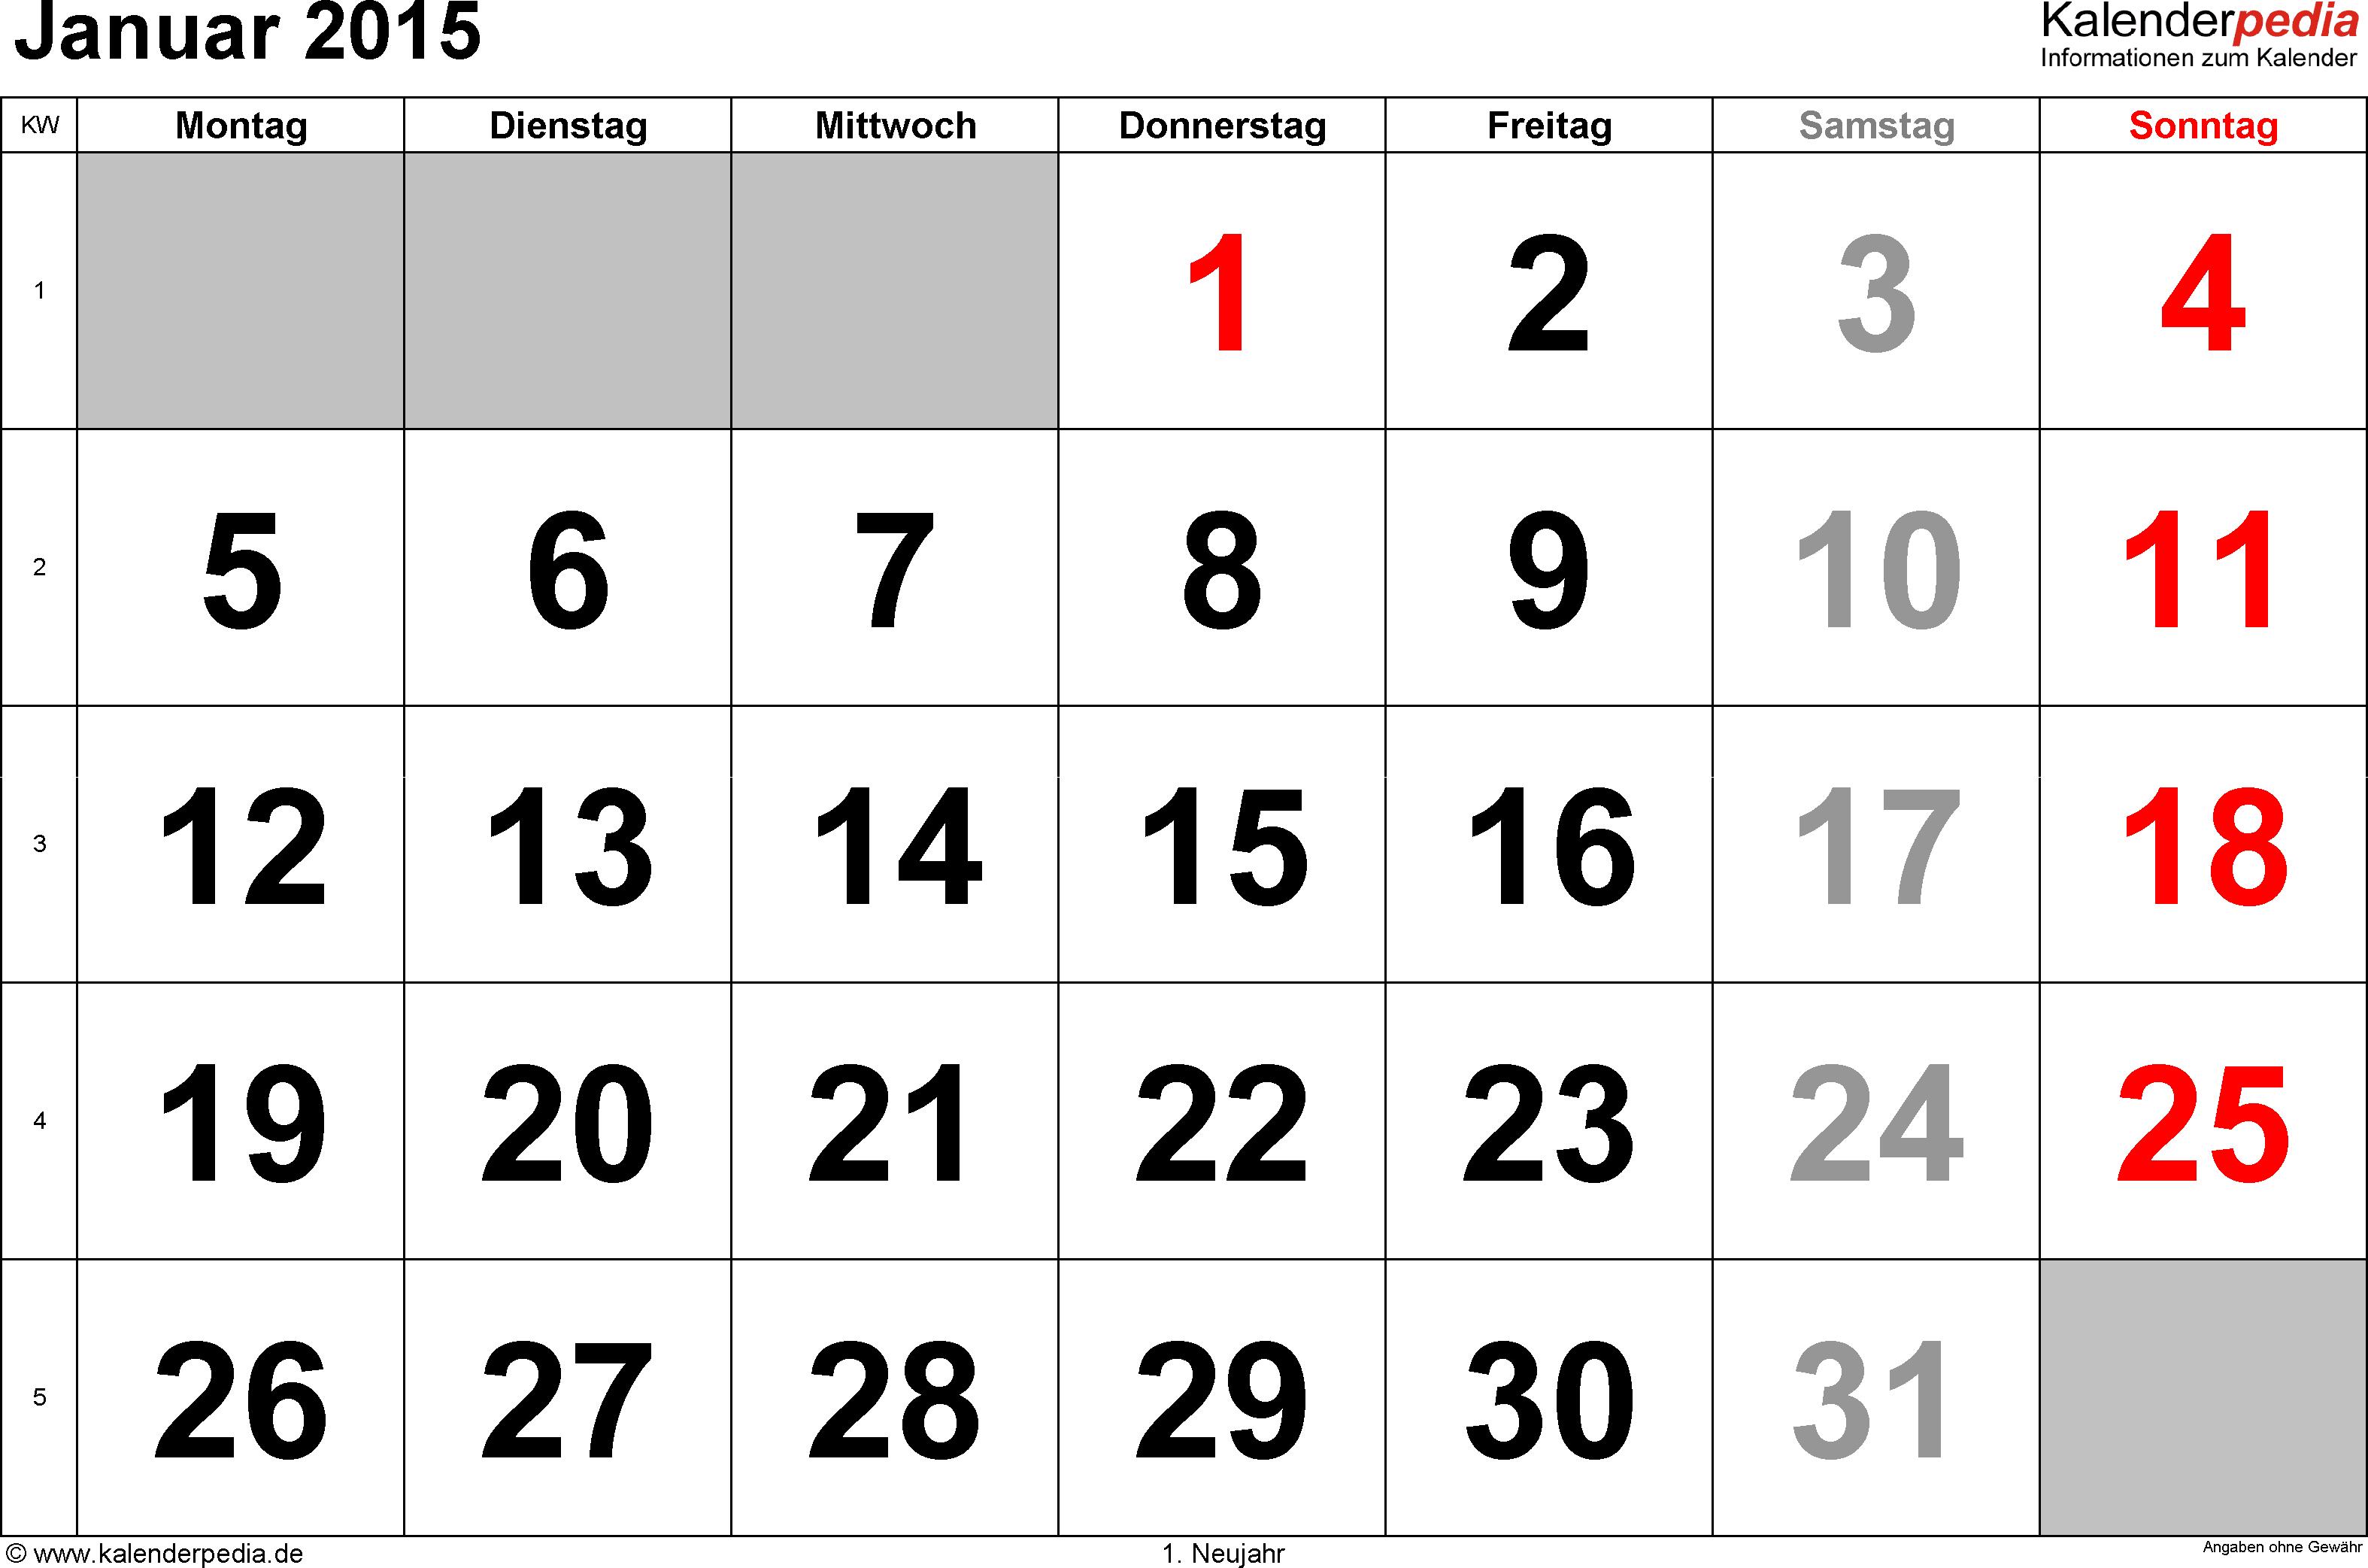 Kalender Januar 2015 im Querformat, grosse Ziffern